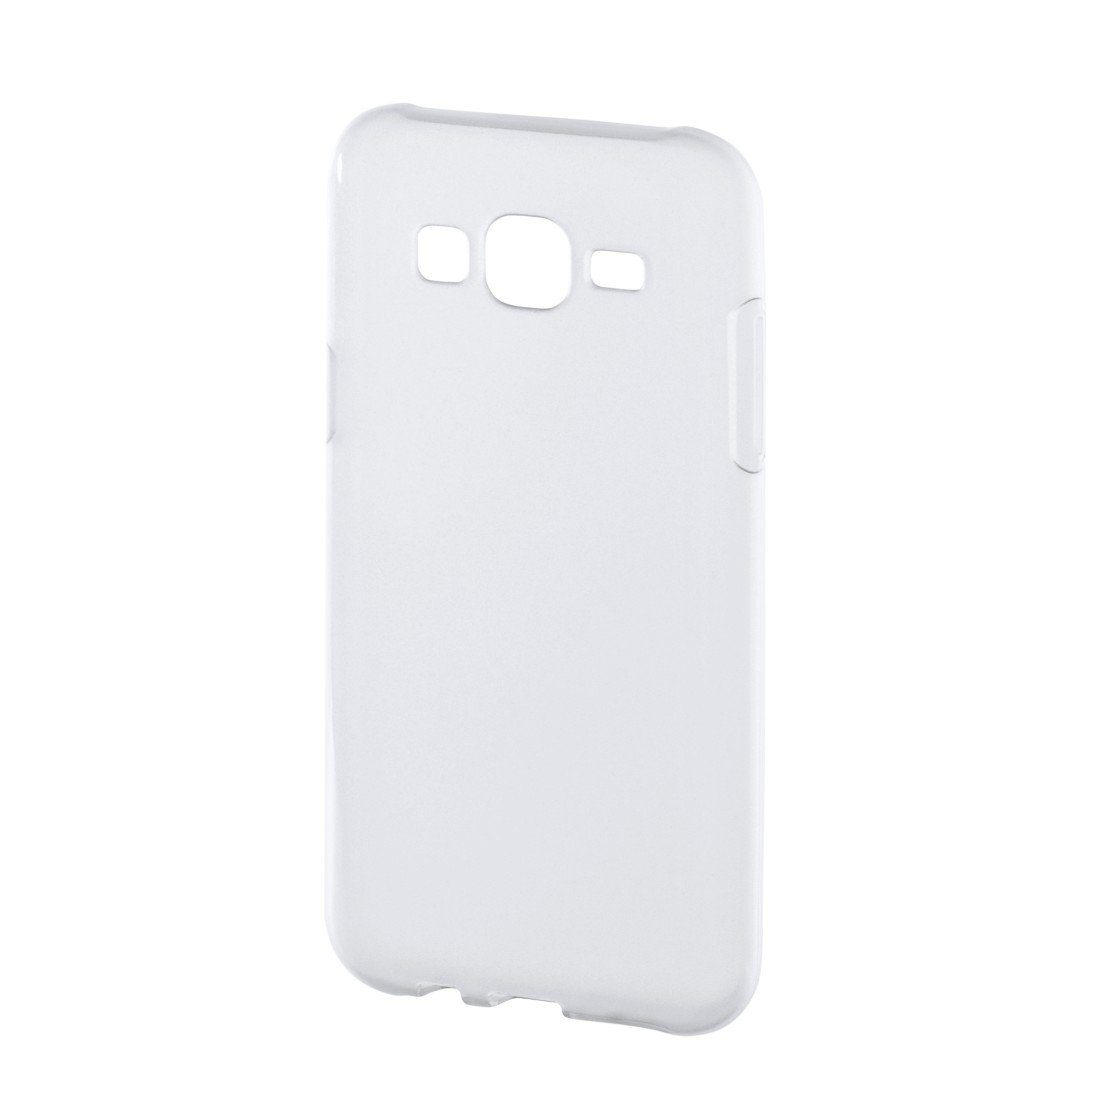 Hama Hülle für Samsung Galaxy J5 Case Schutzhülle Handyhülle »Handy Cover aus flexiblem TPU«